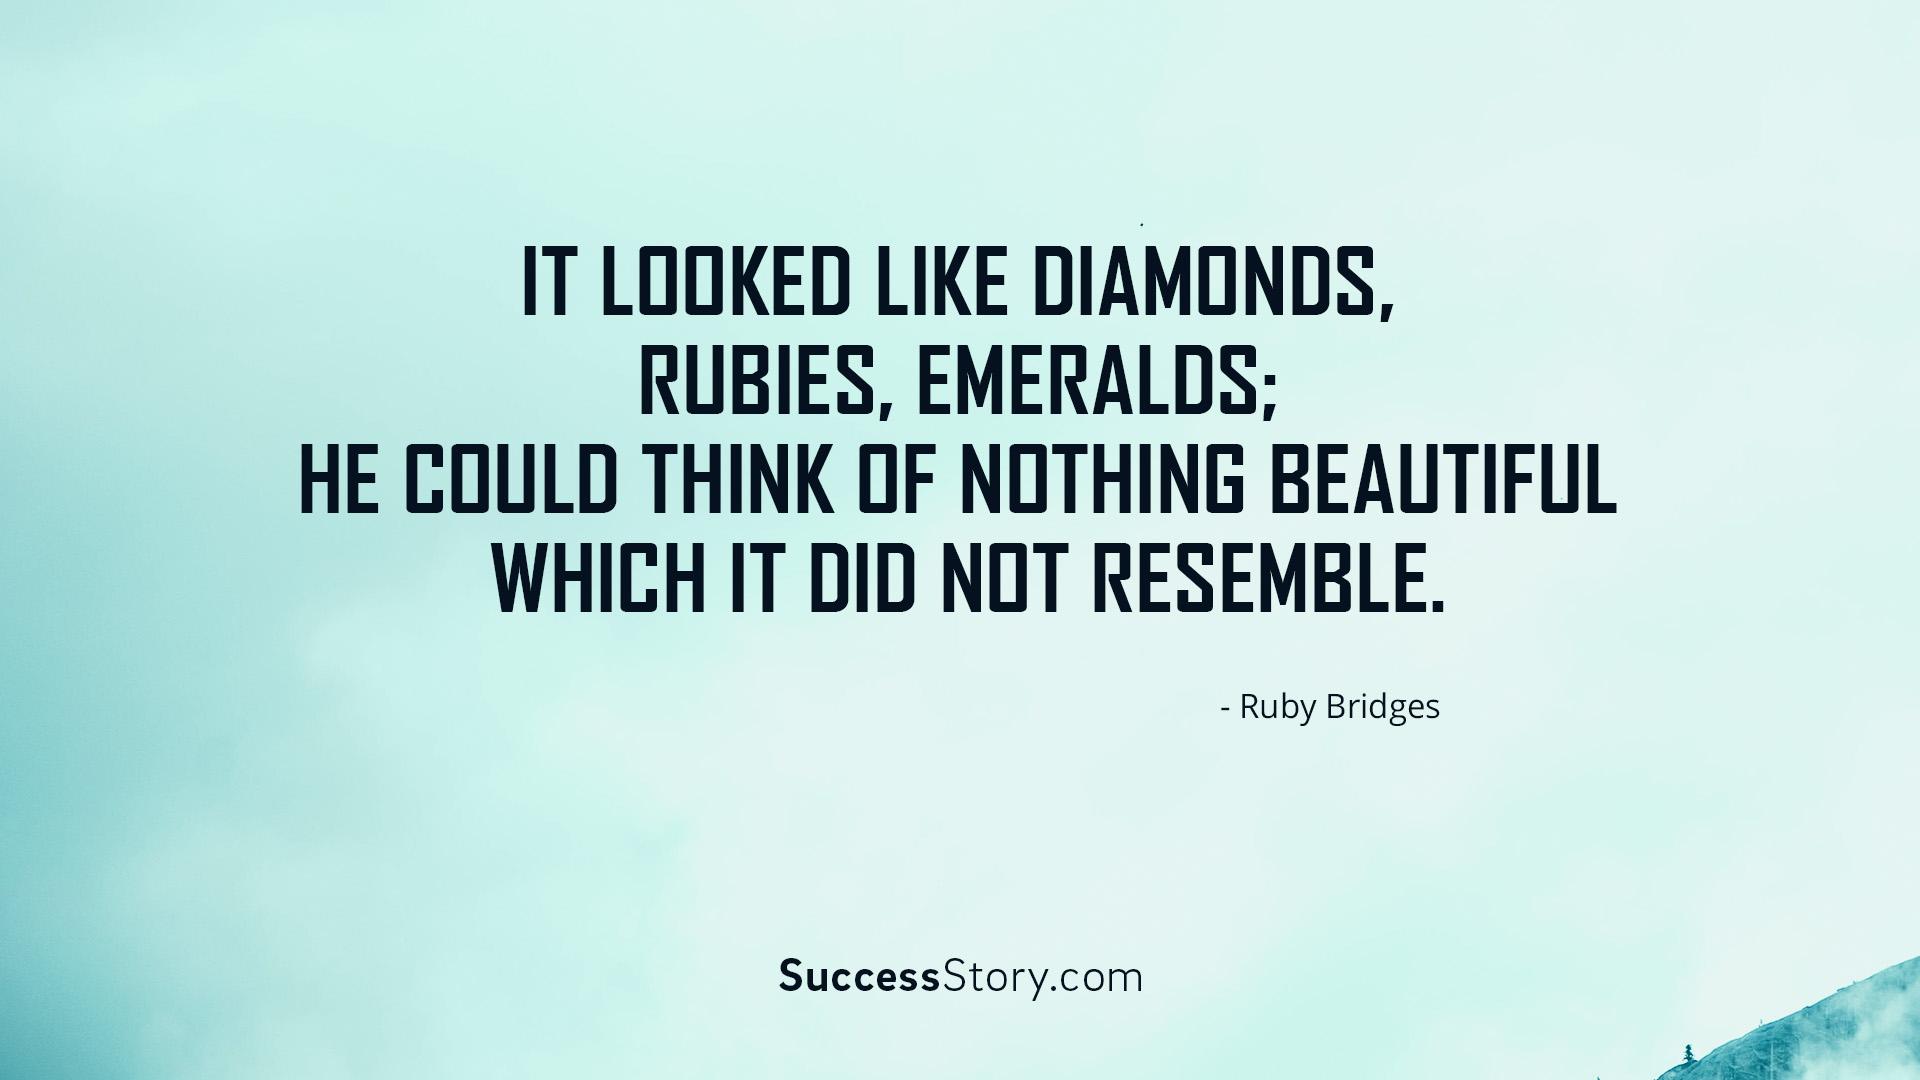 It looked like diamonds